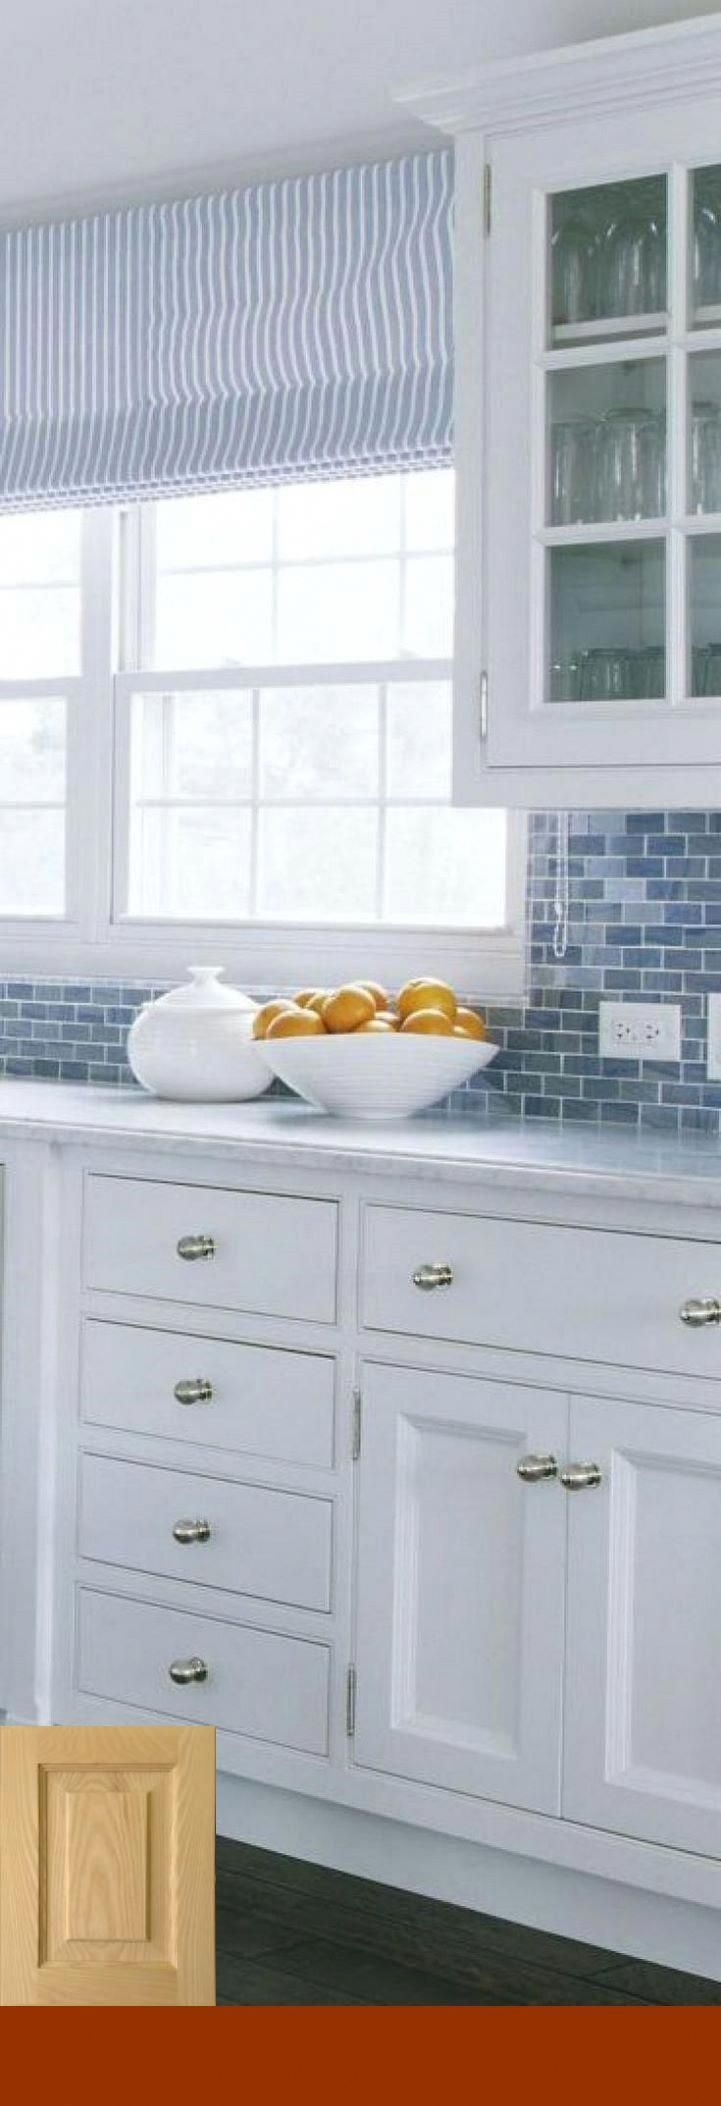 Homewyse Kitchen Remodel Estimate Kitchenremodelestimate Mutfak Yenileme Yeni Mutfak Modelleri Ic Mekan Fikirleri